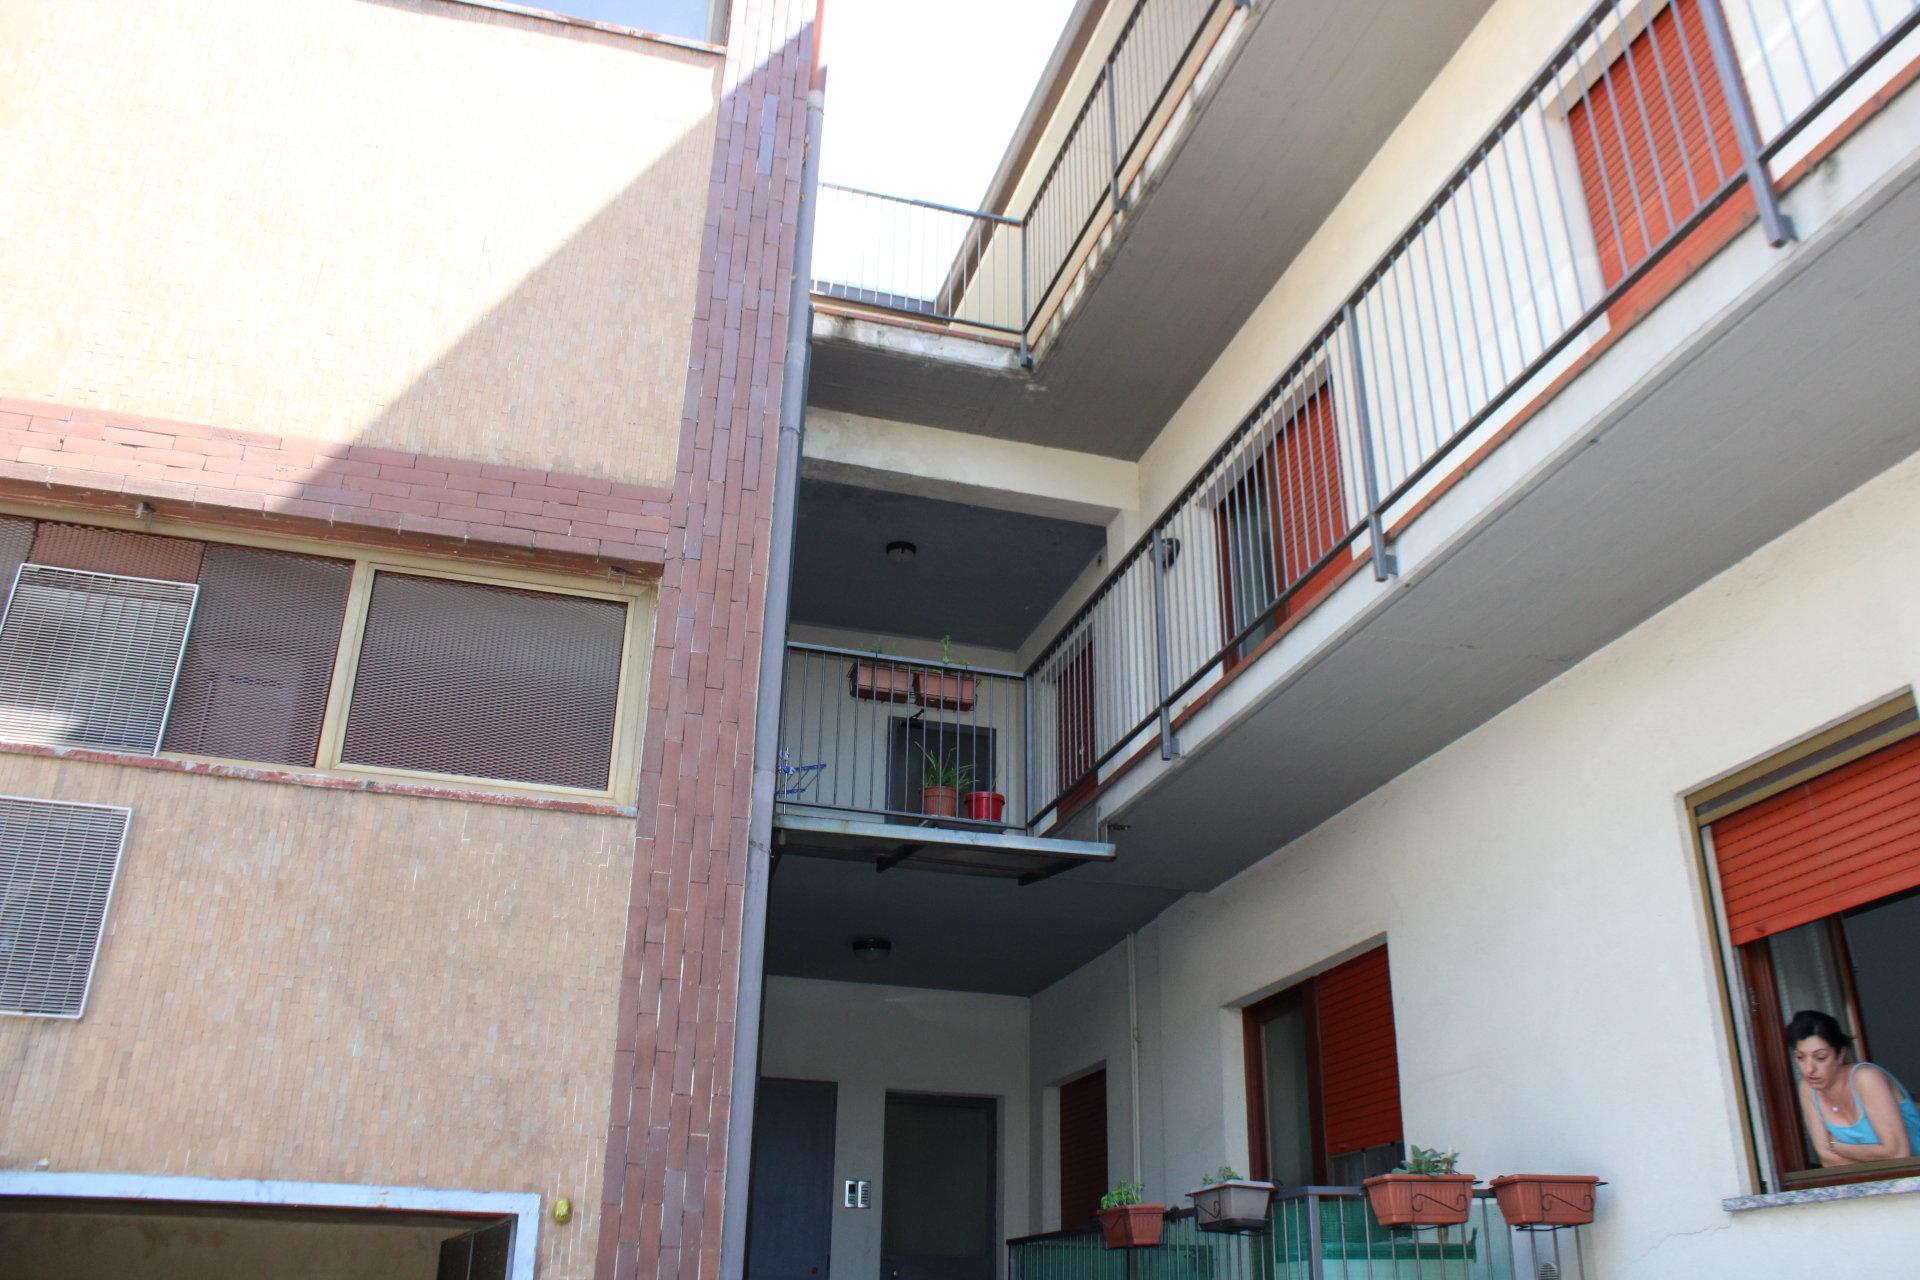 Sale Apartment - Carimate Montesolaro - Italy